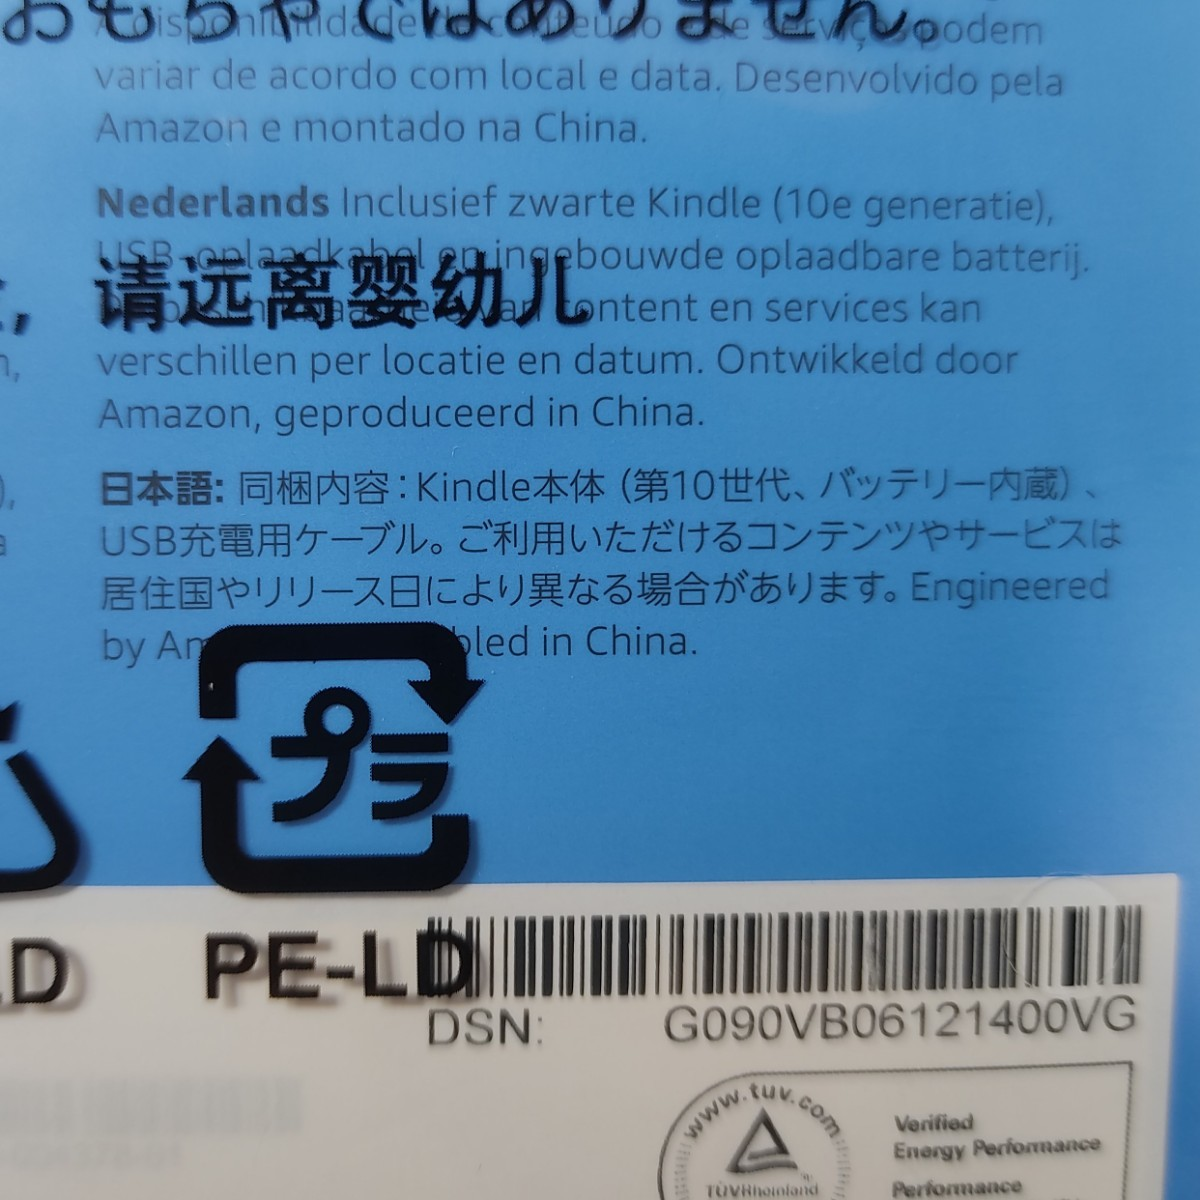 Kindle フロントライト搭載 Wi-Fi 8GB ブラック 第10世代 広告なし